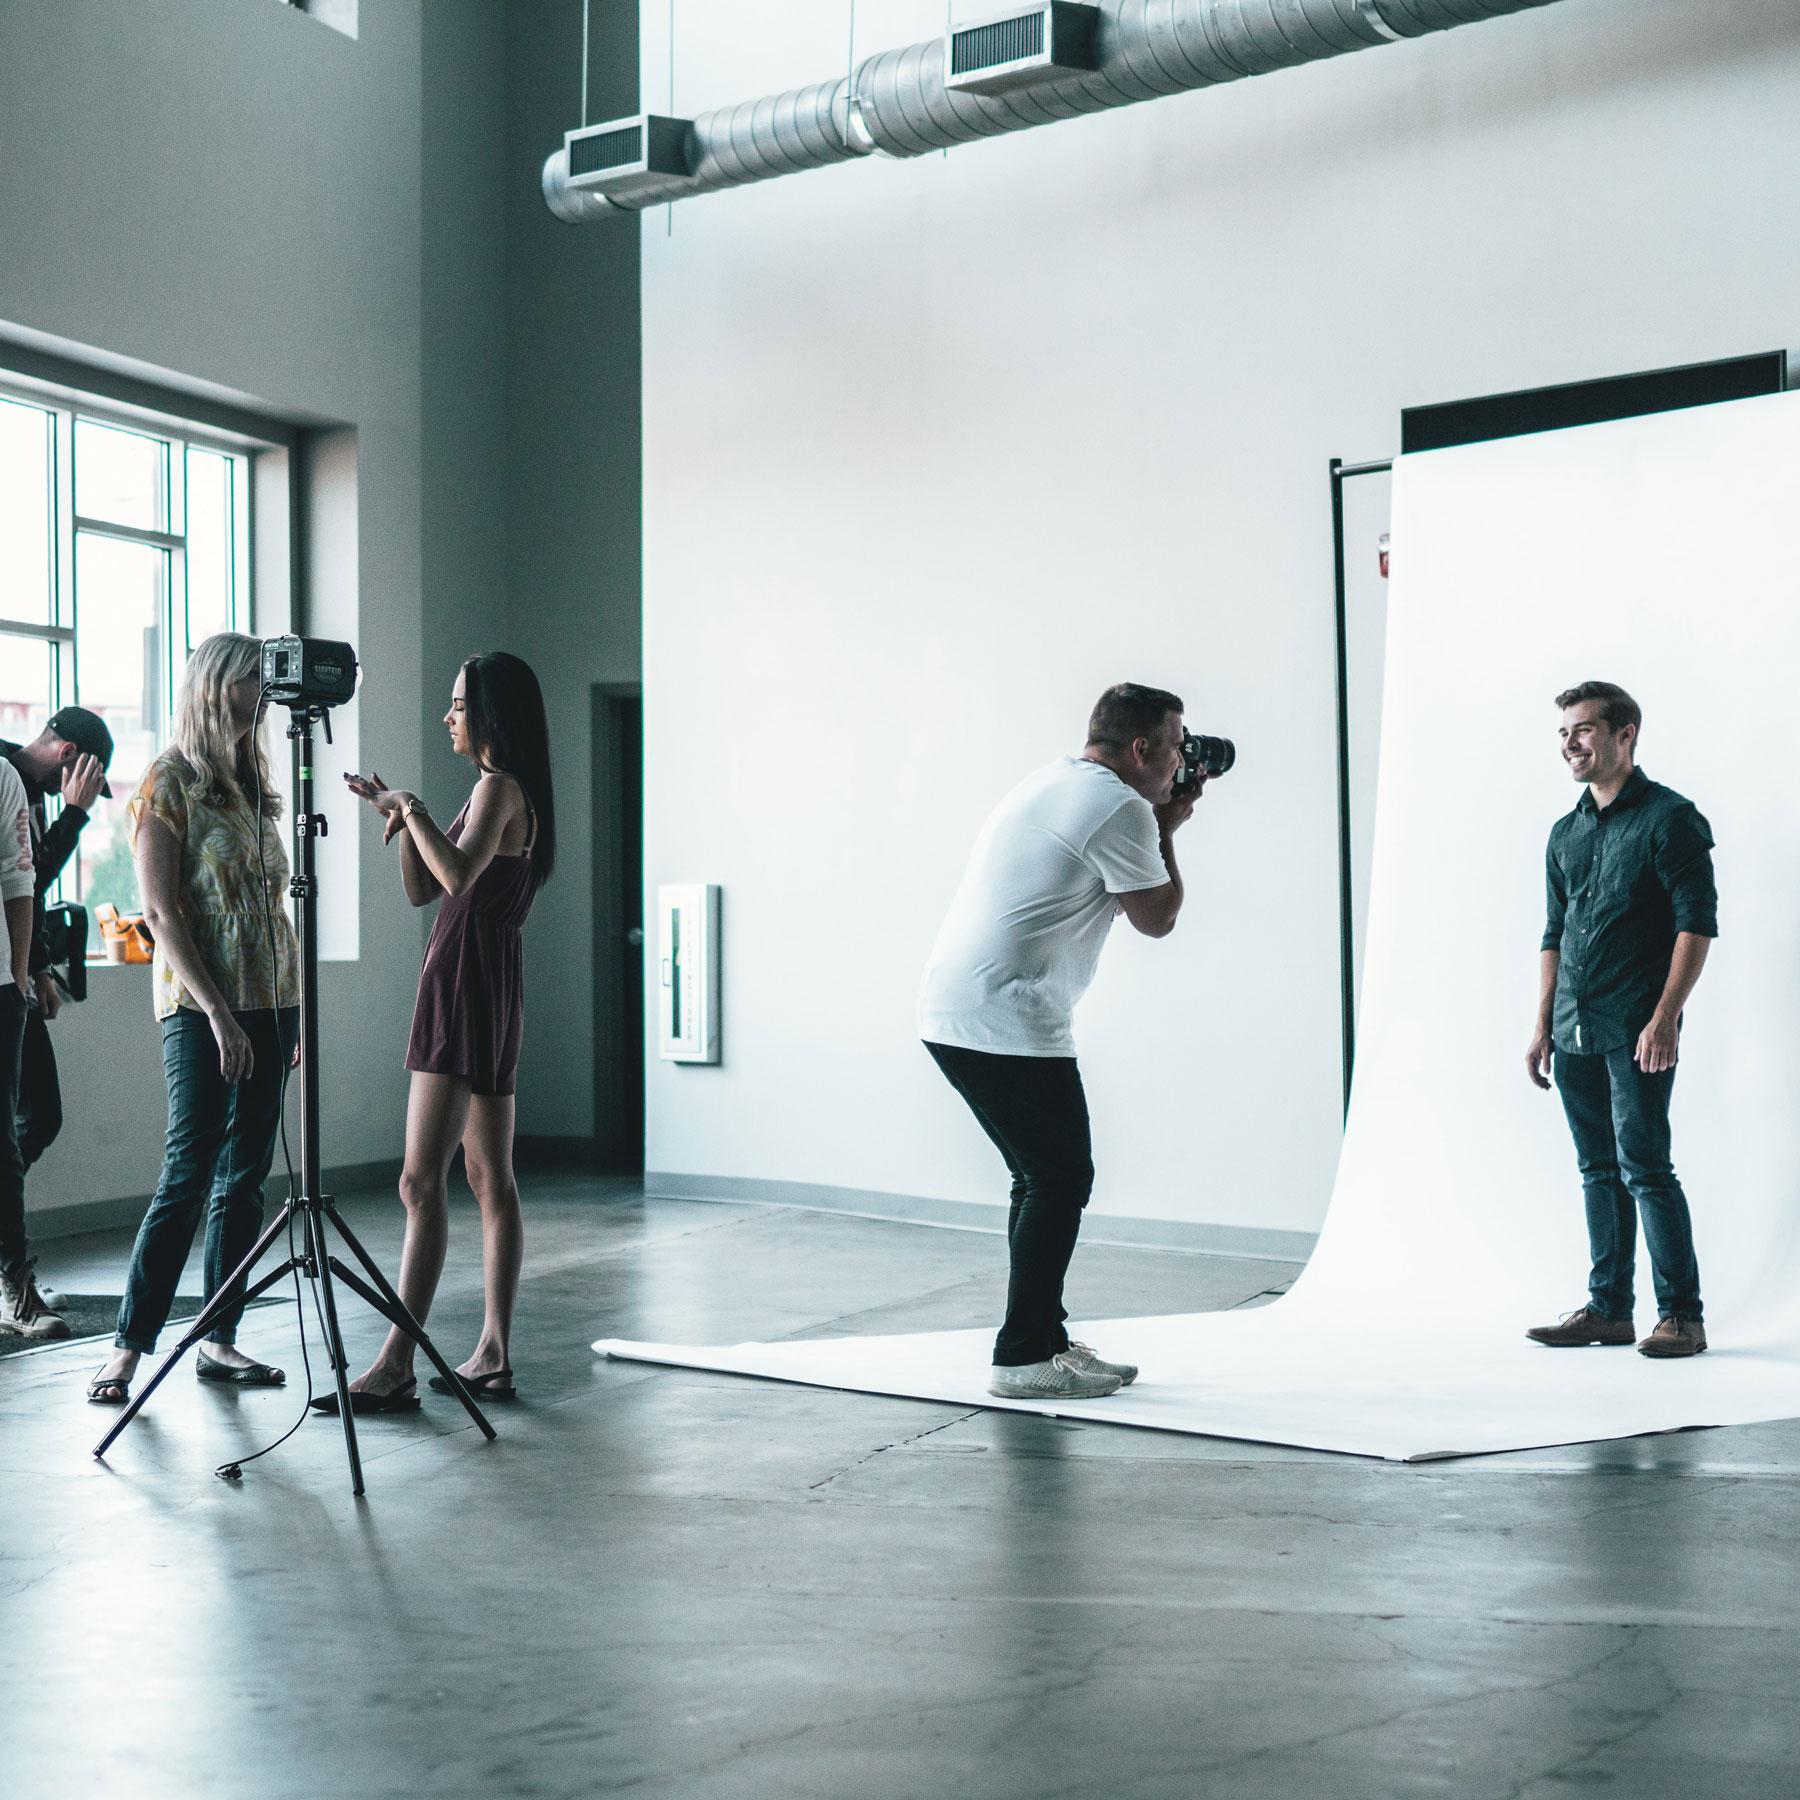 Corporate Fotografie Coaching